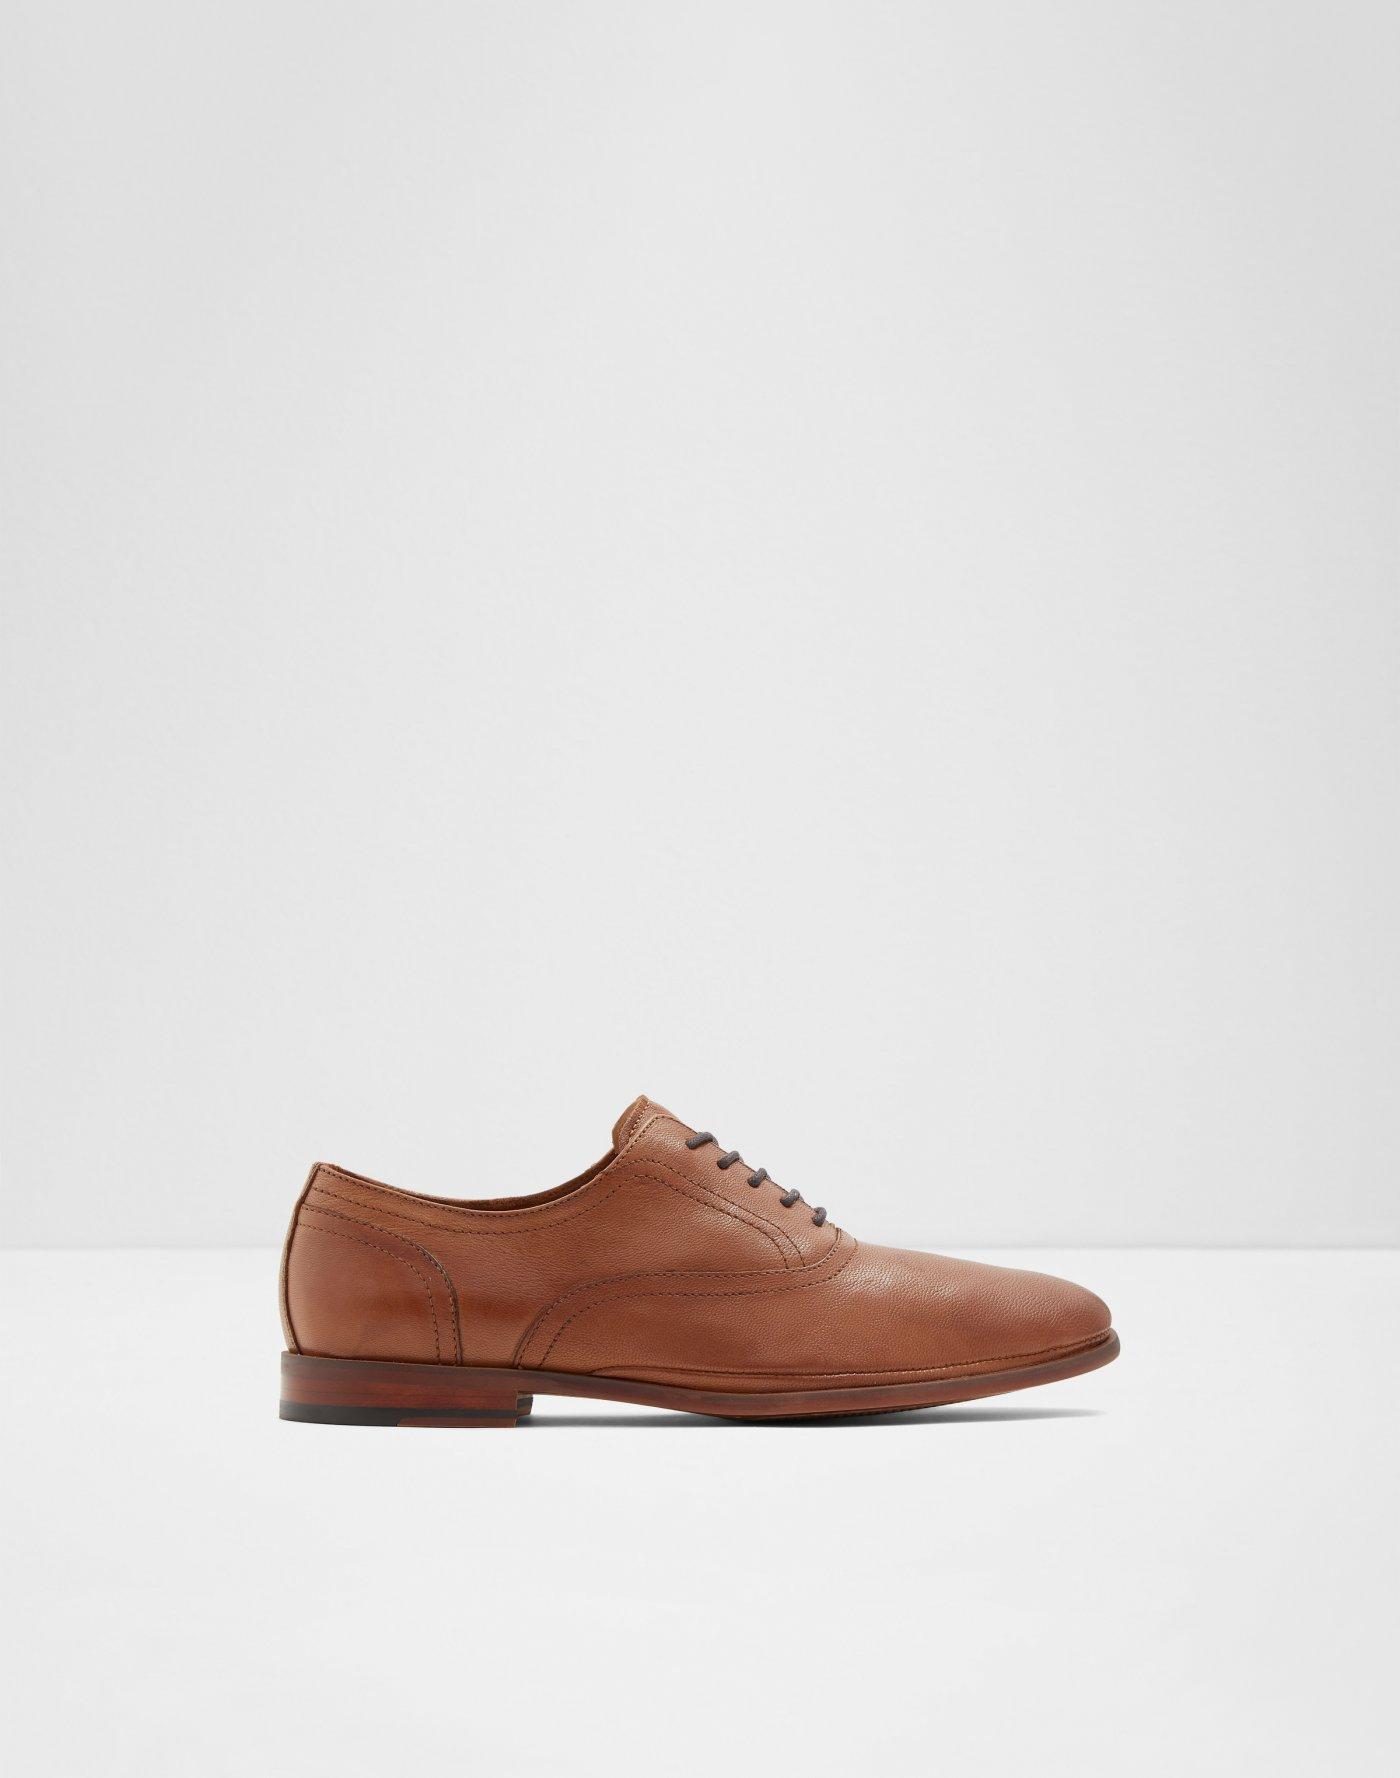 d9f7a8e4ad4 All Men's Sales | Shoes, Accessories And Wallets | ALDO US ...